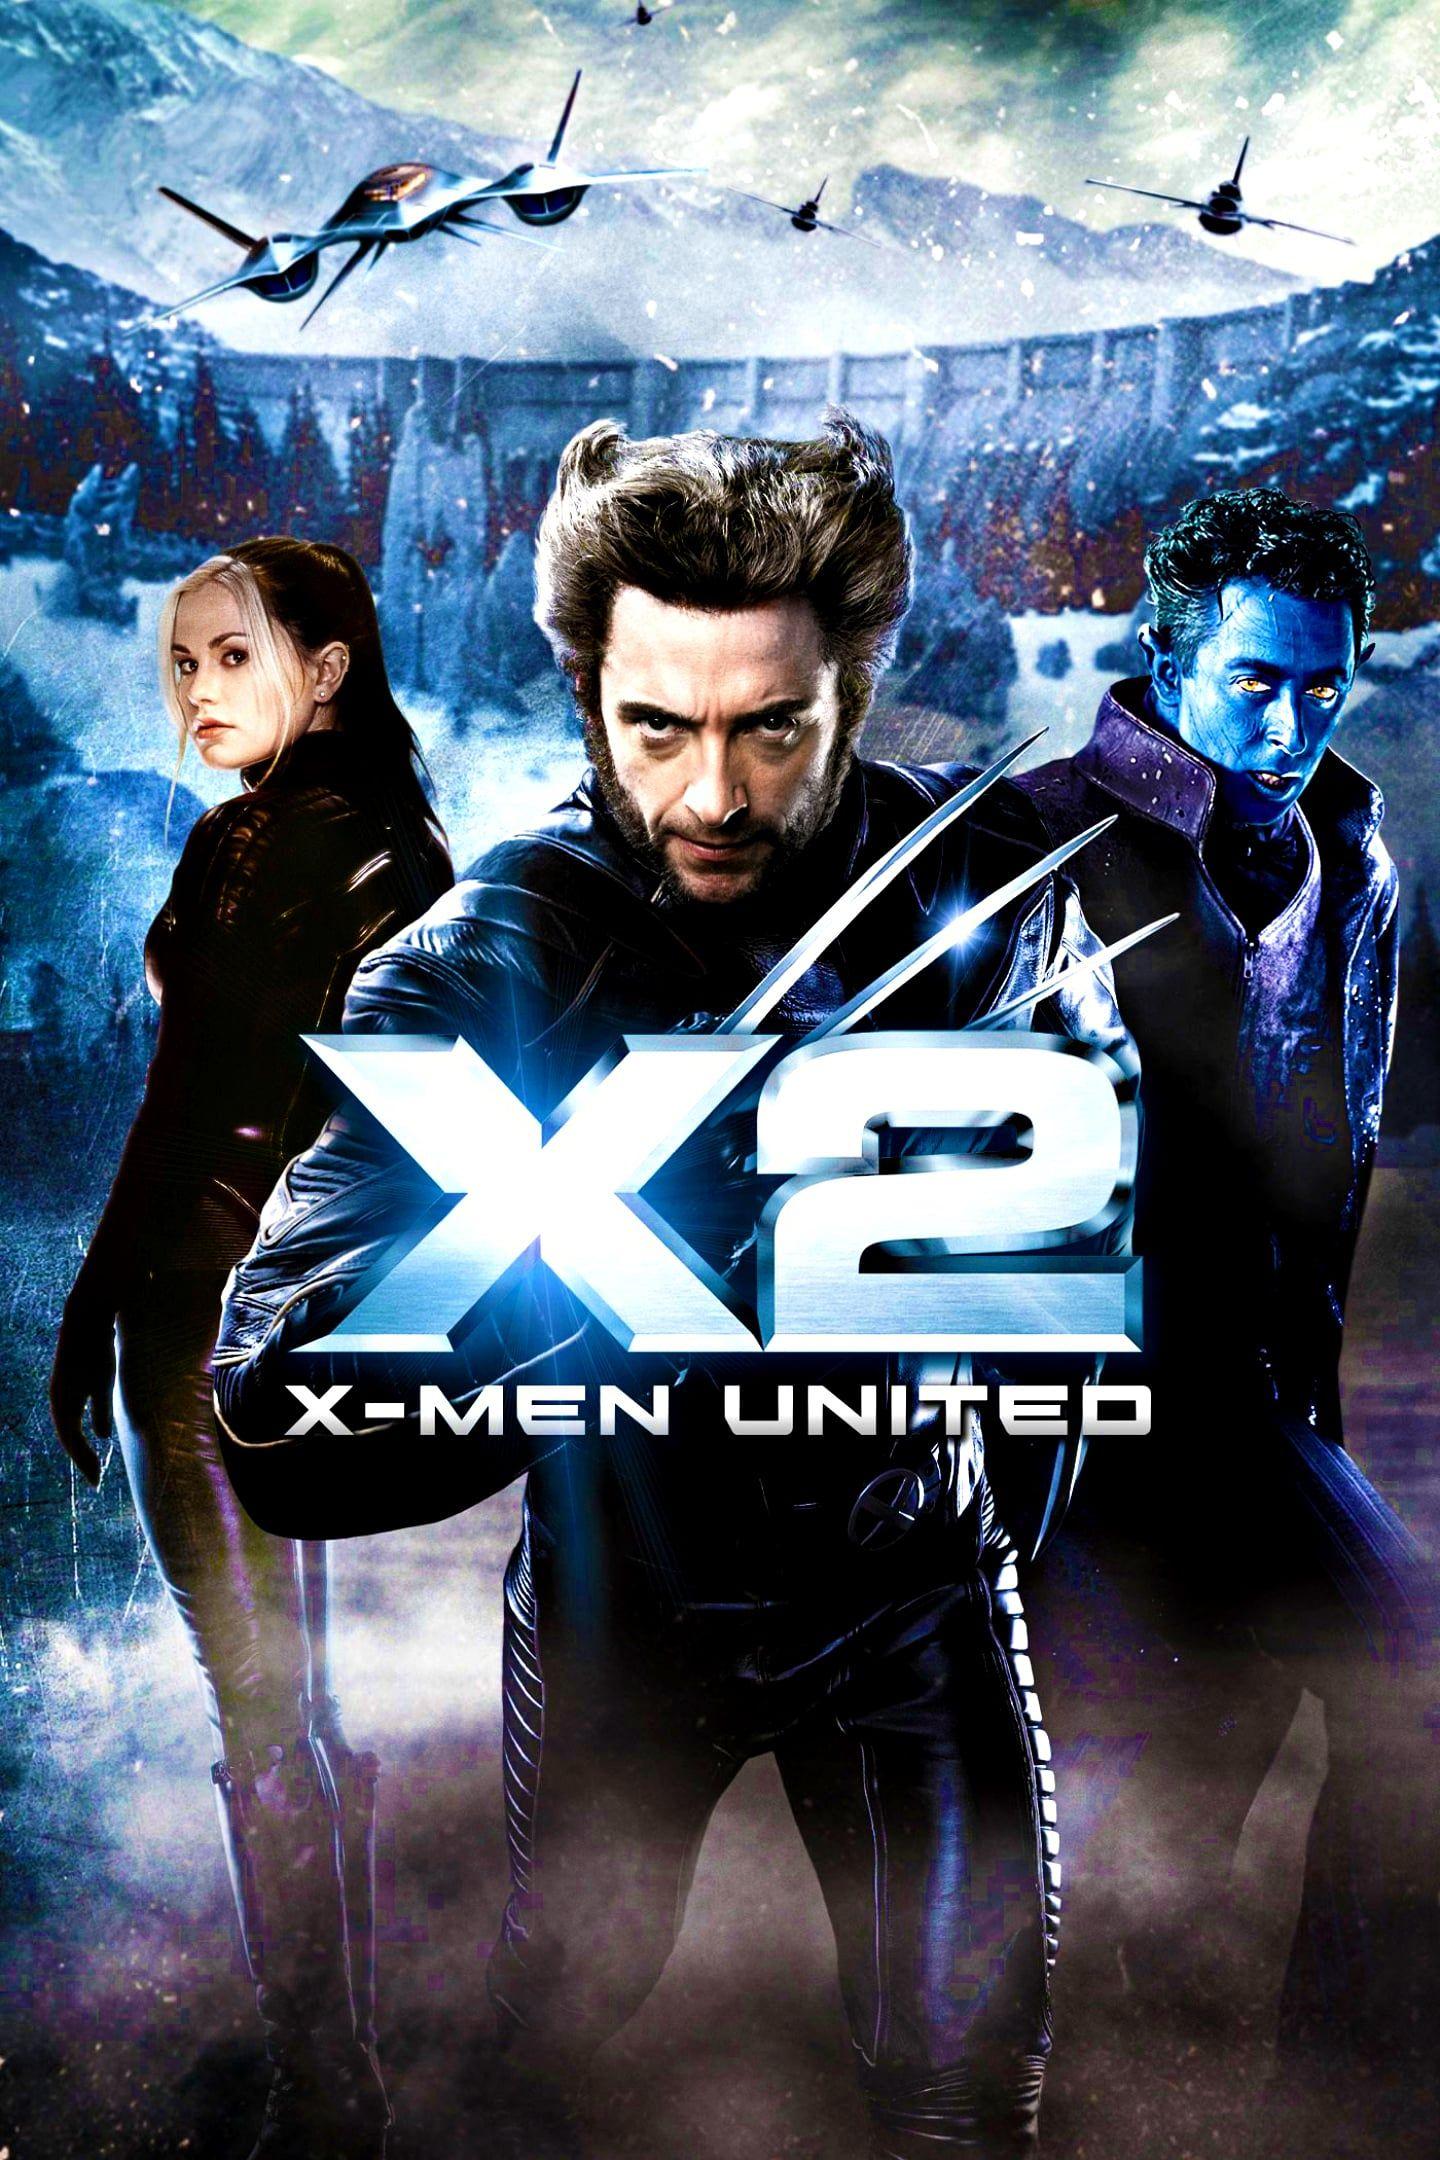 2019{{DOWNLOAD}}™ X2 exércit durad filme cmplet dublad in